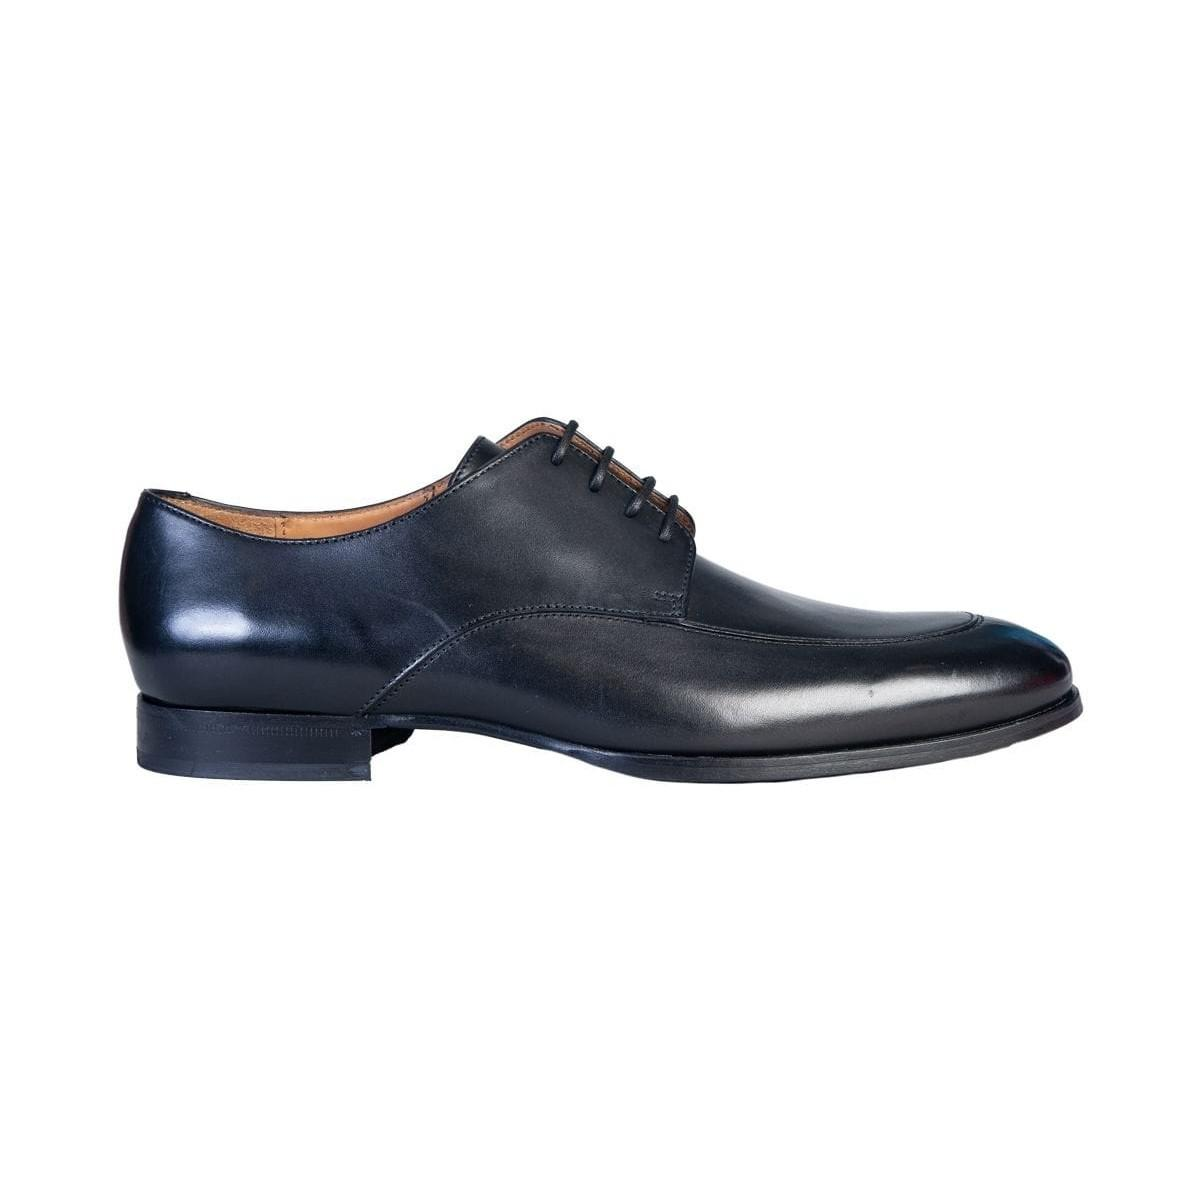 76d0b5dbc4dc BOSS. Shoes Model Quot hannover Derb 50380227 Quot  Men s Smart   Formal  Shoes In Black